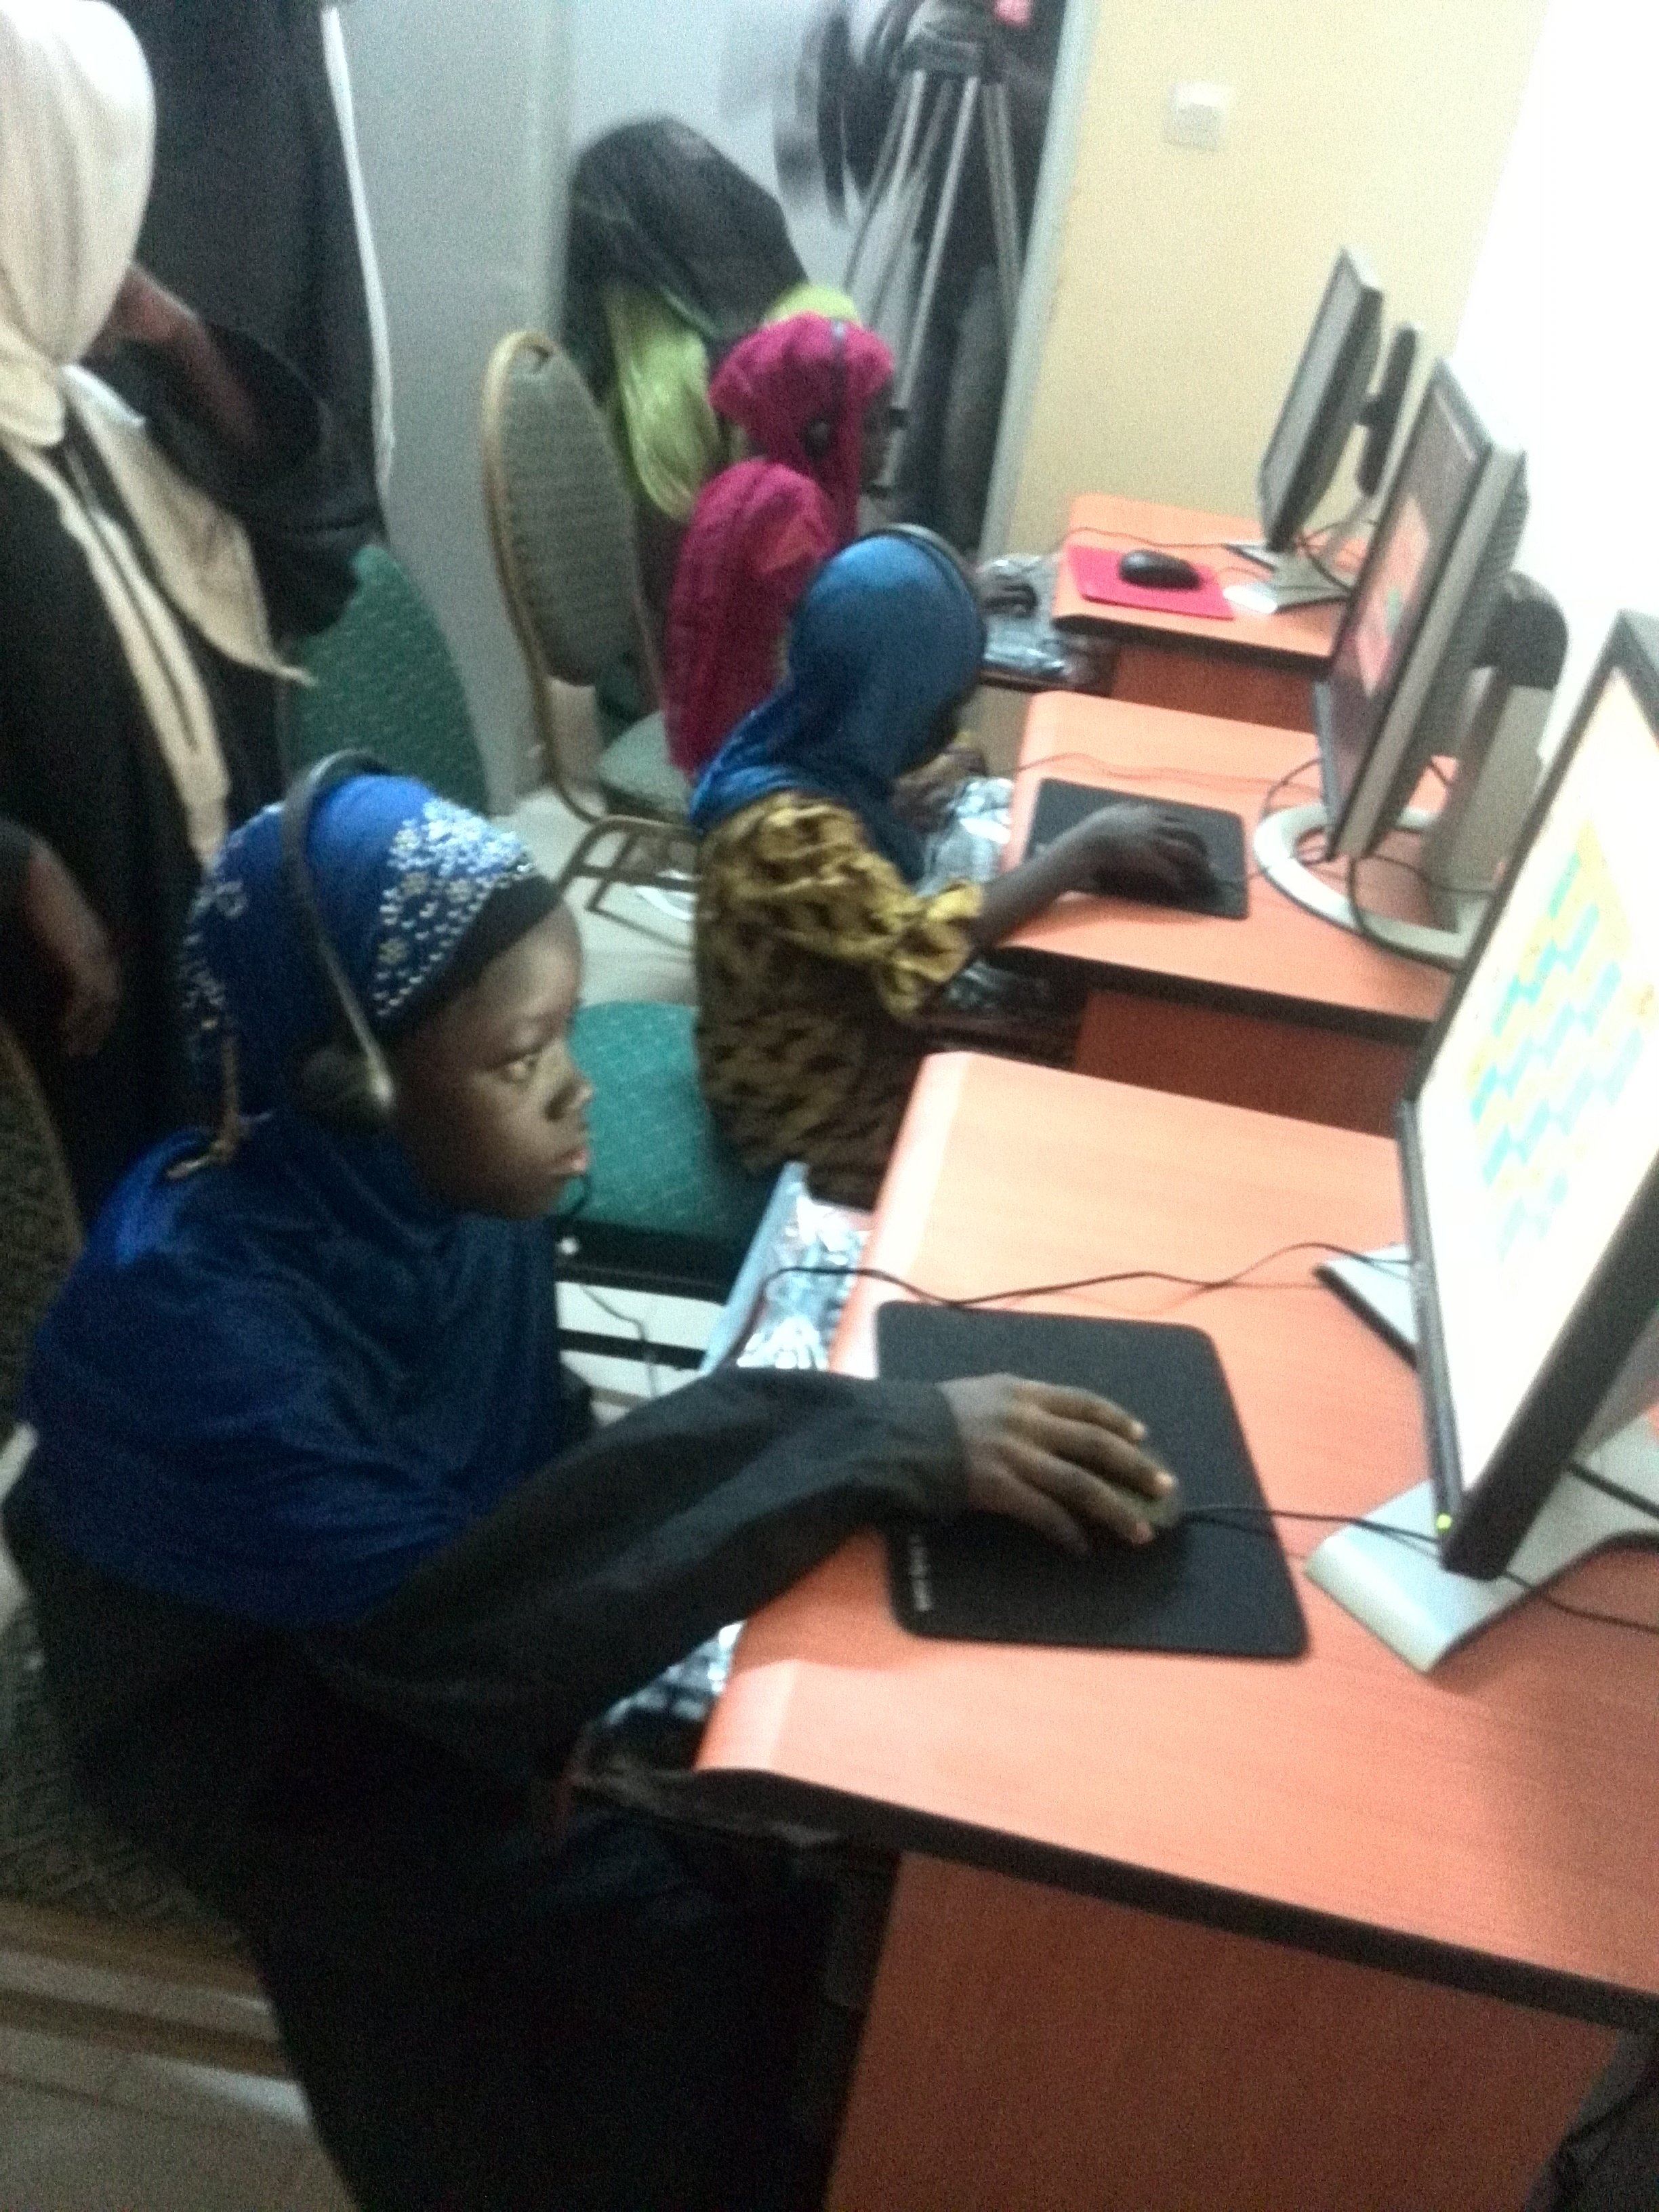 Porokhane : L'ADIE installe une salle multimédia au Daara Mame Diarra Bousso